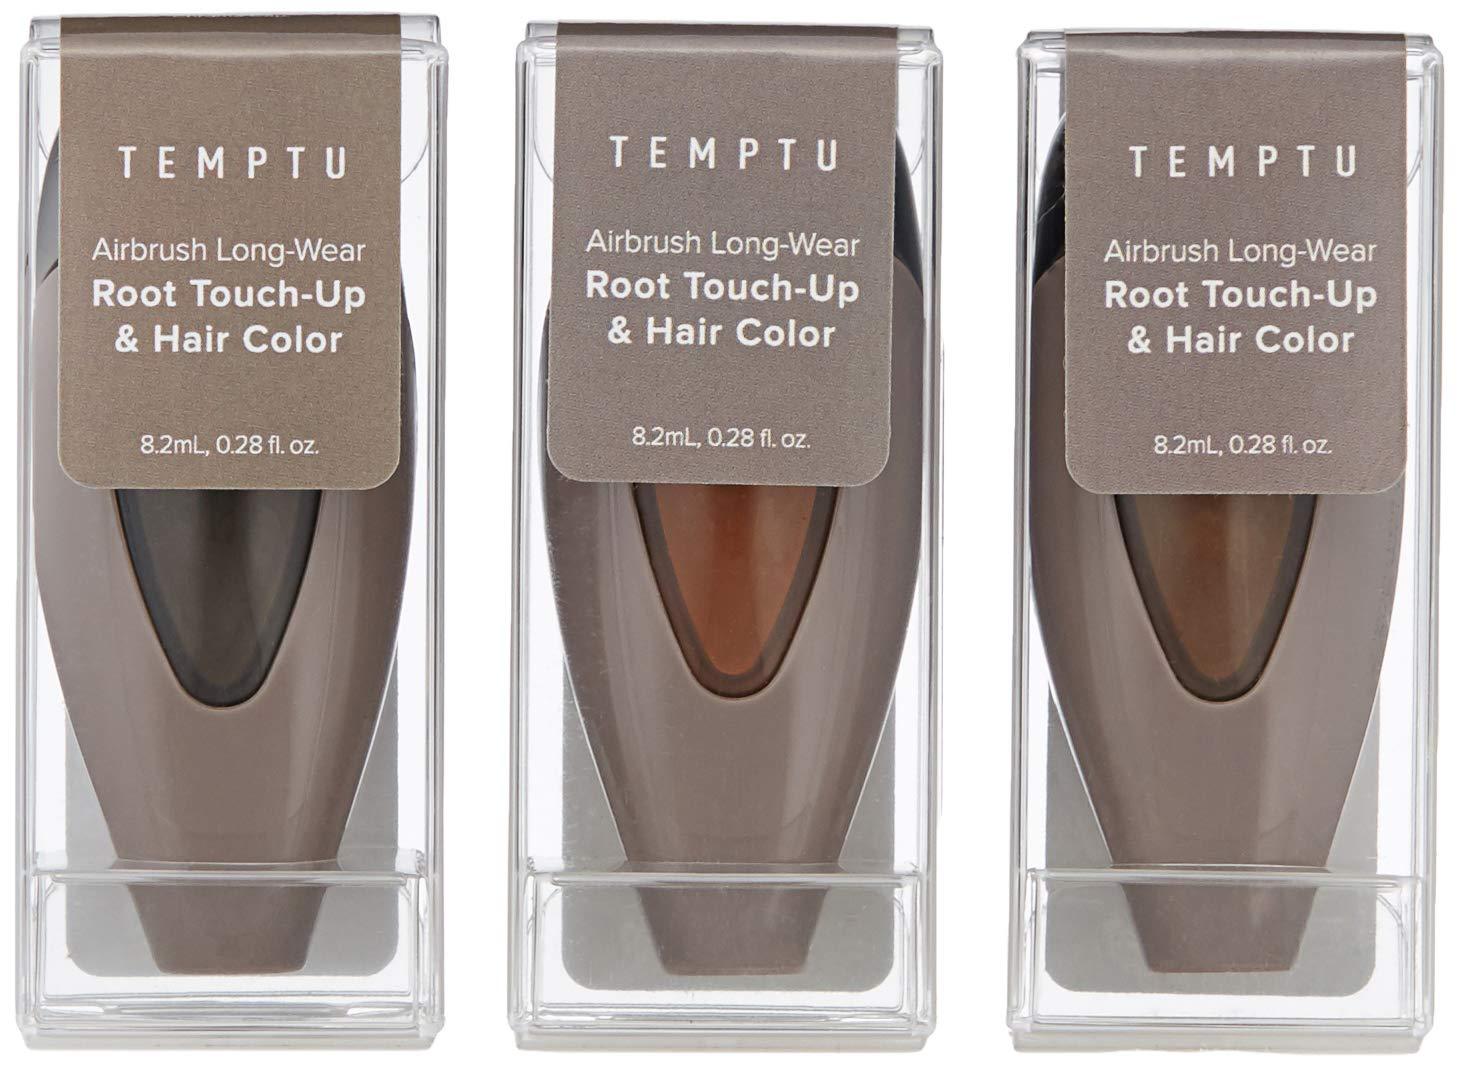 Temptu Air Barber Easy Kit, Brown/Black; Dark Brown; Medium Brown by Temptu (Image #7)